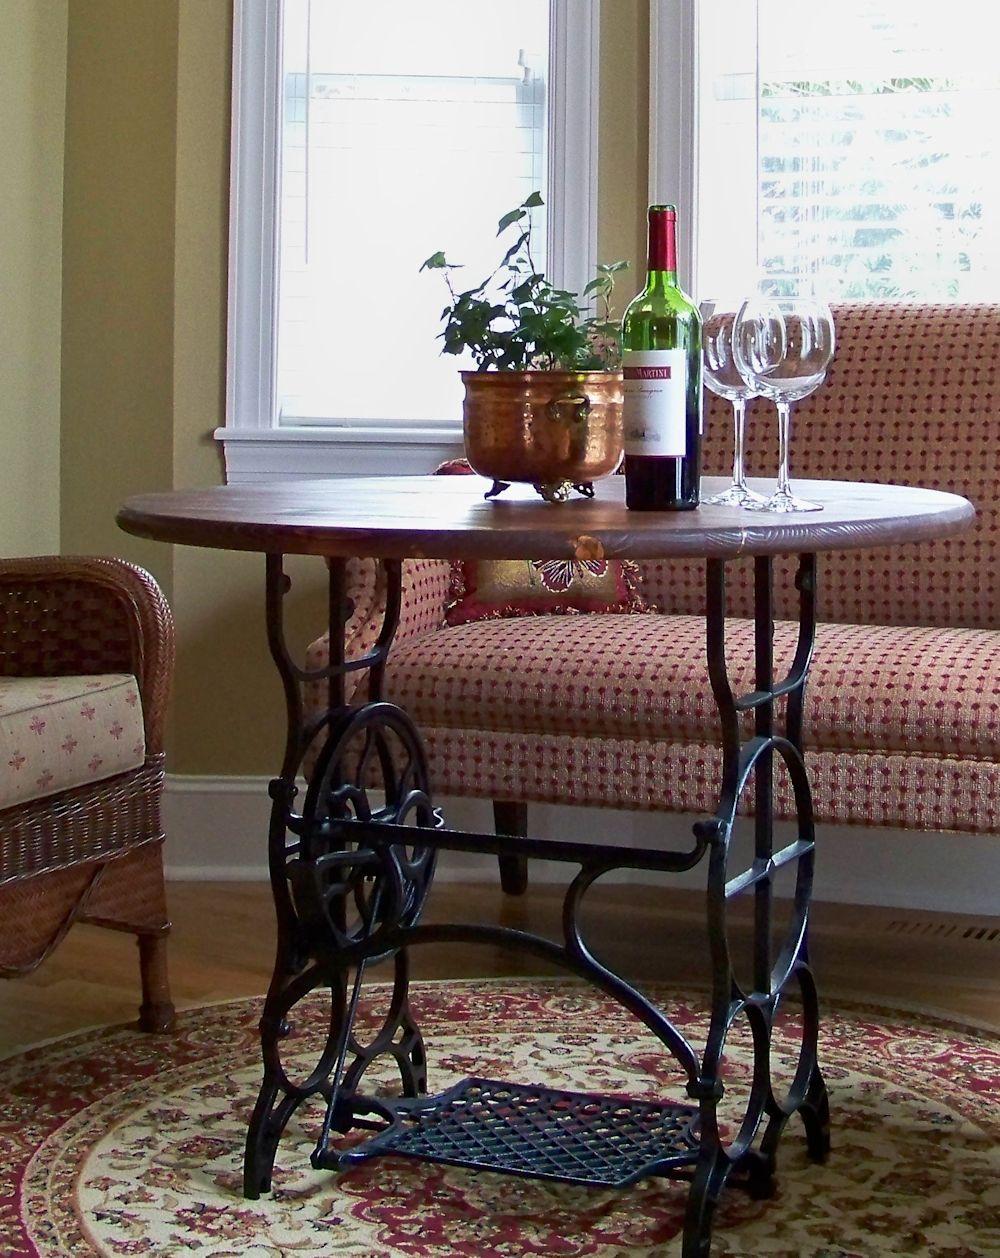 Best 25 Table Bases Ideas On Pinterest Wood Table Bases Coffee Table Legs And Bases And Legs